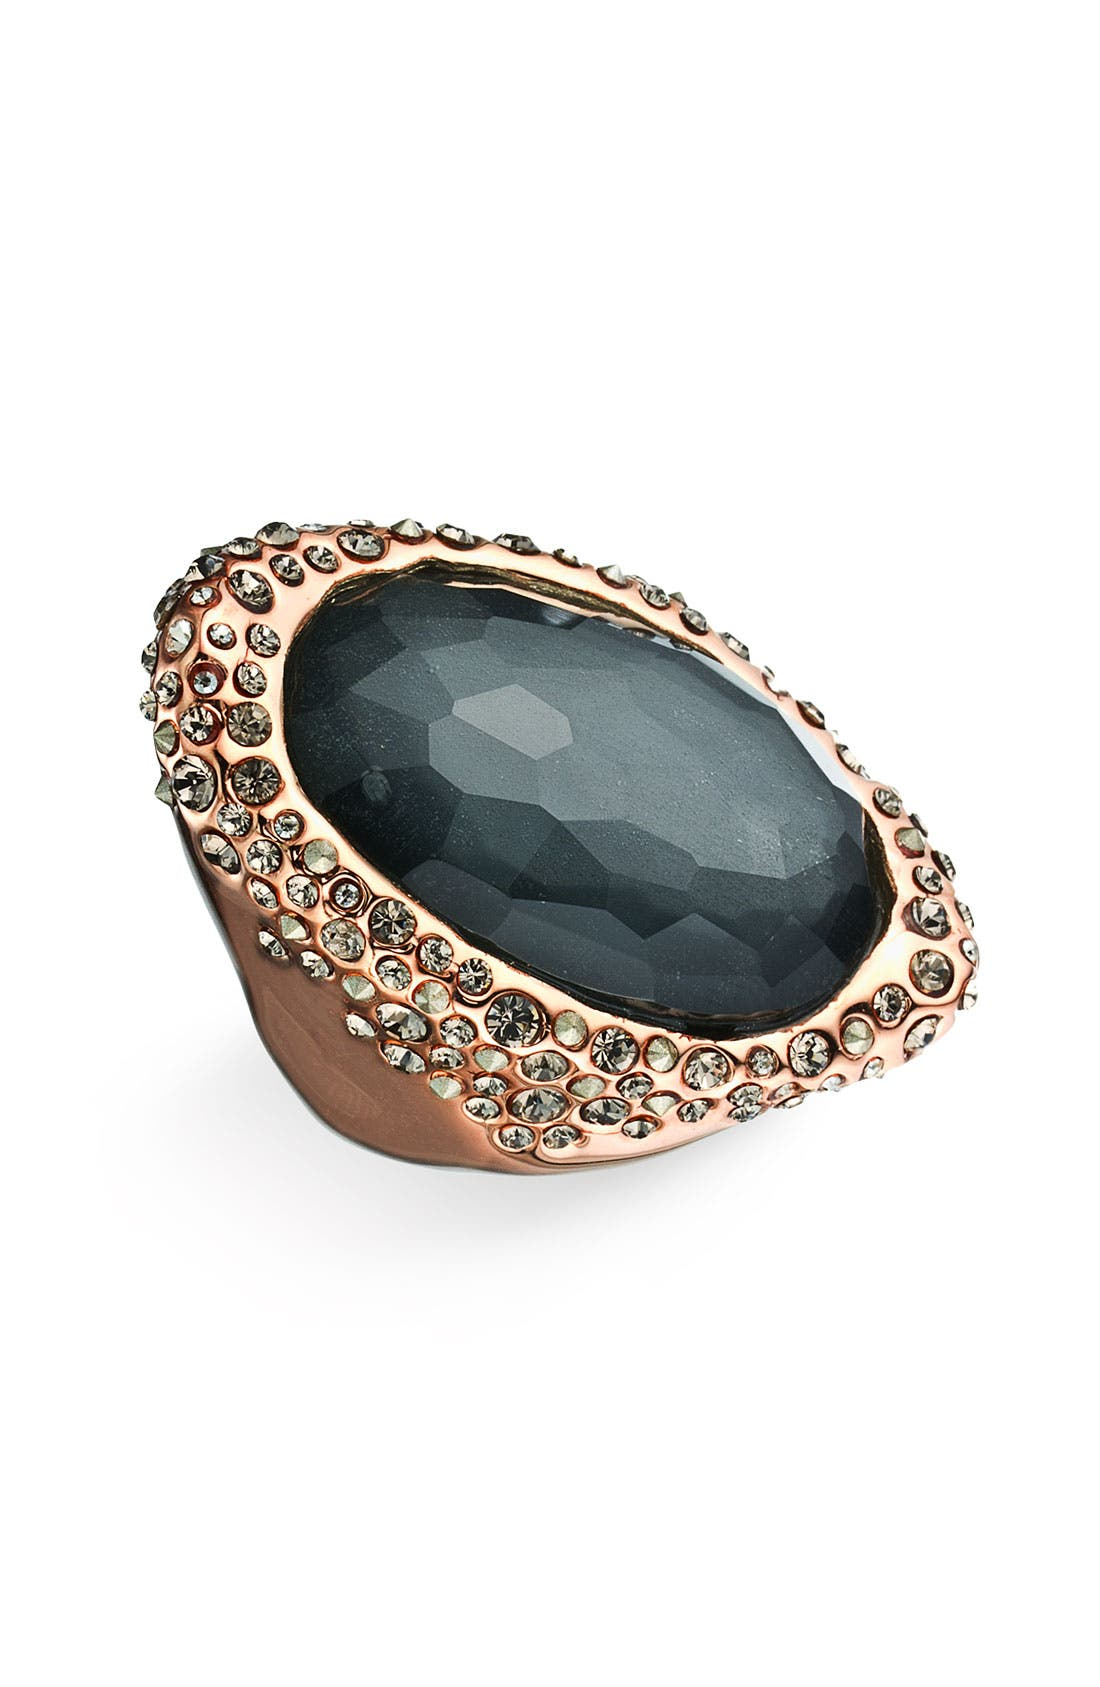 Main Image - Alexis Bittar 'Miss Havisham' Crystal Encrusted Doublet Ring